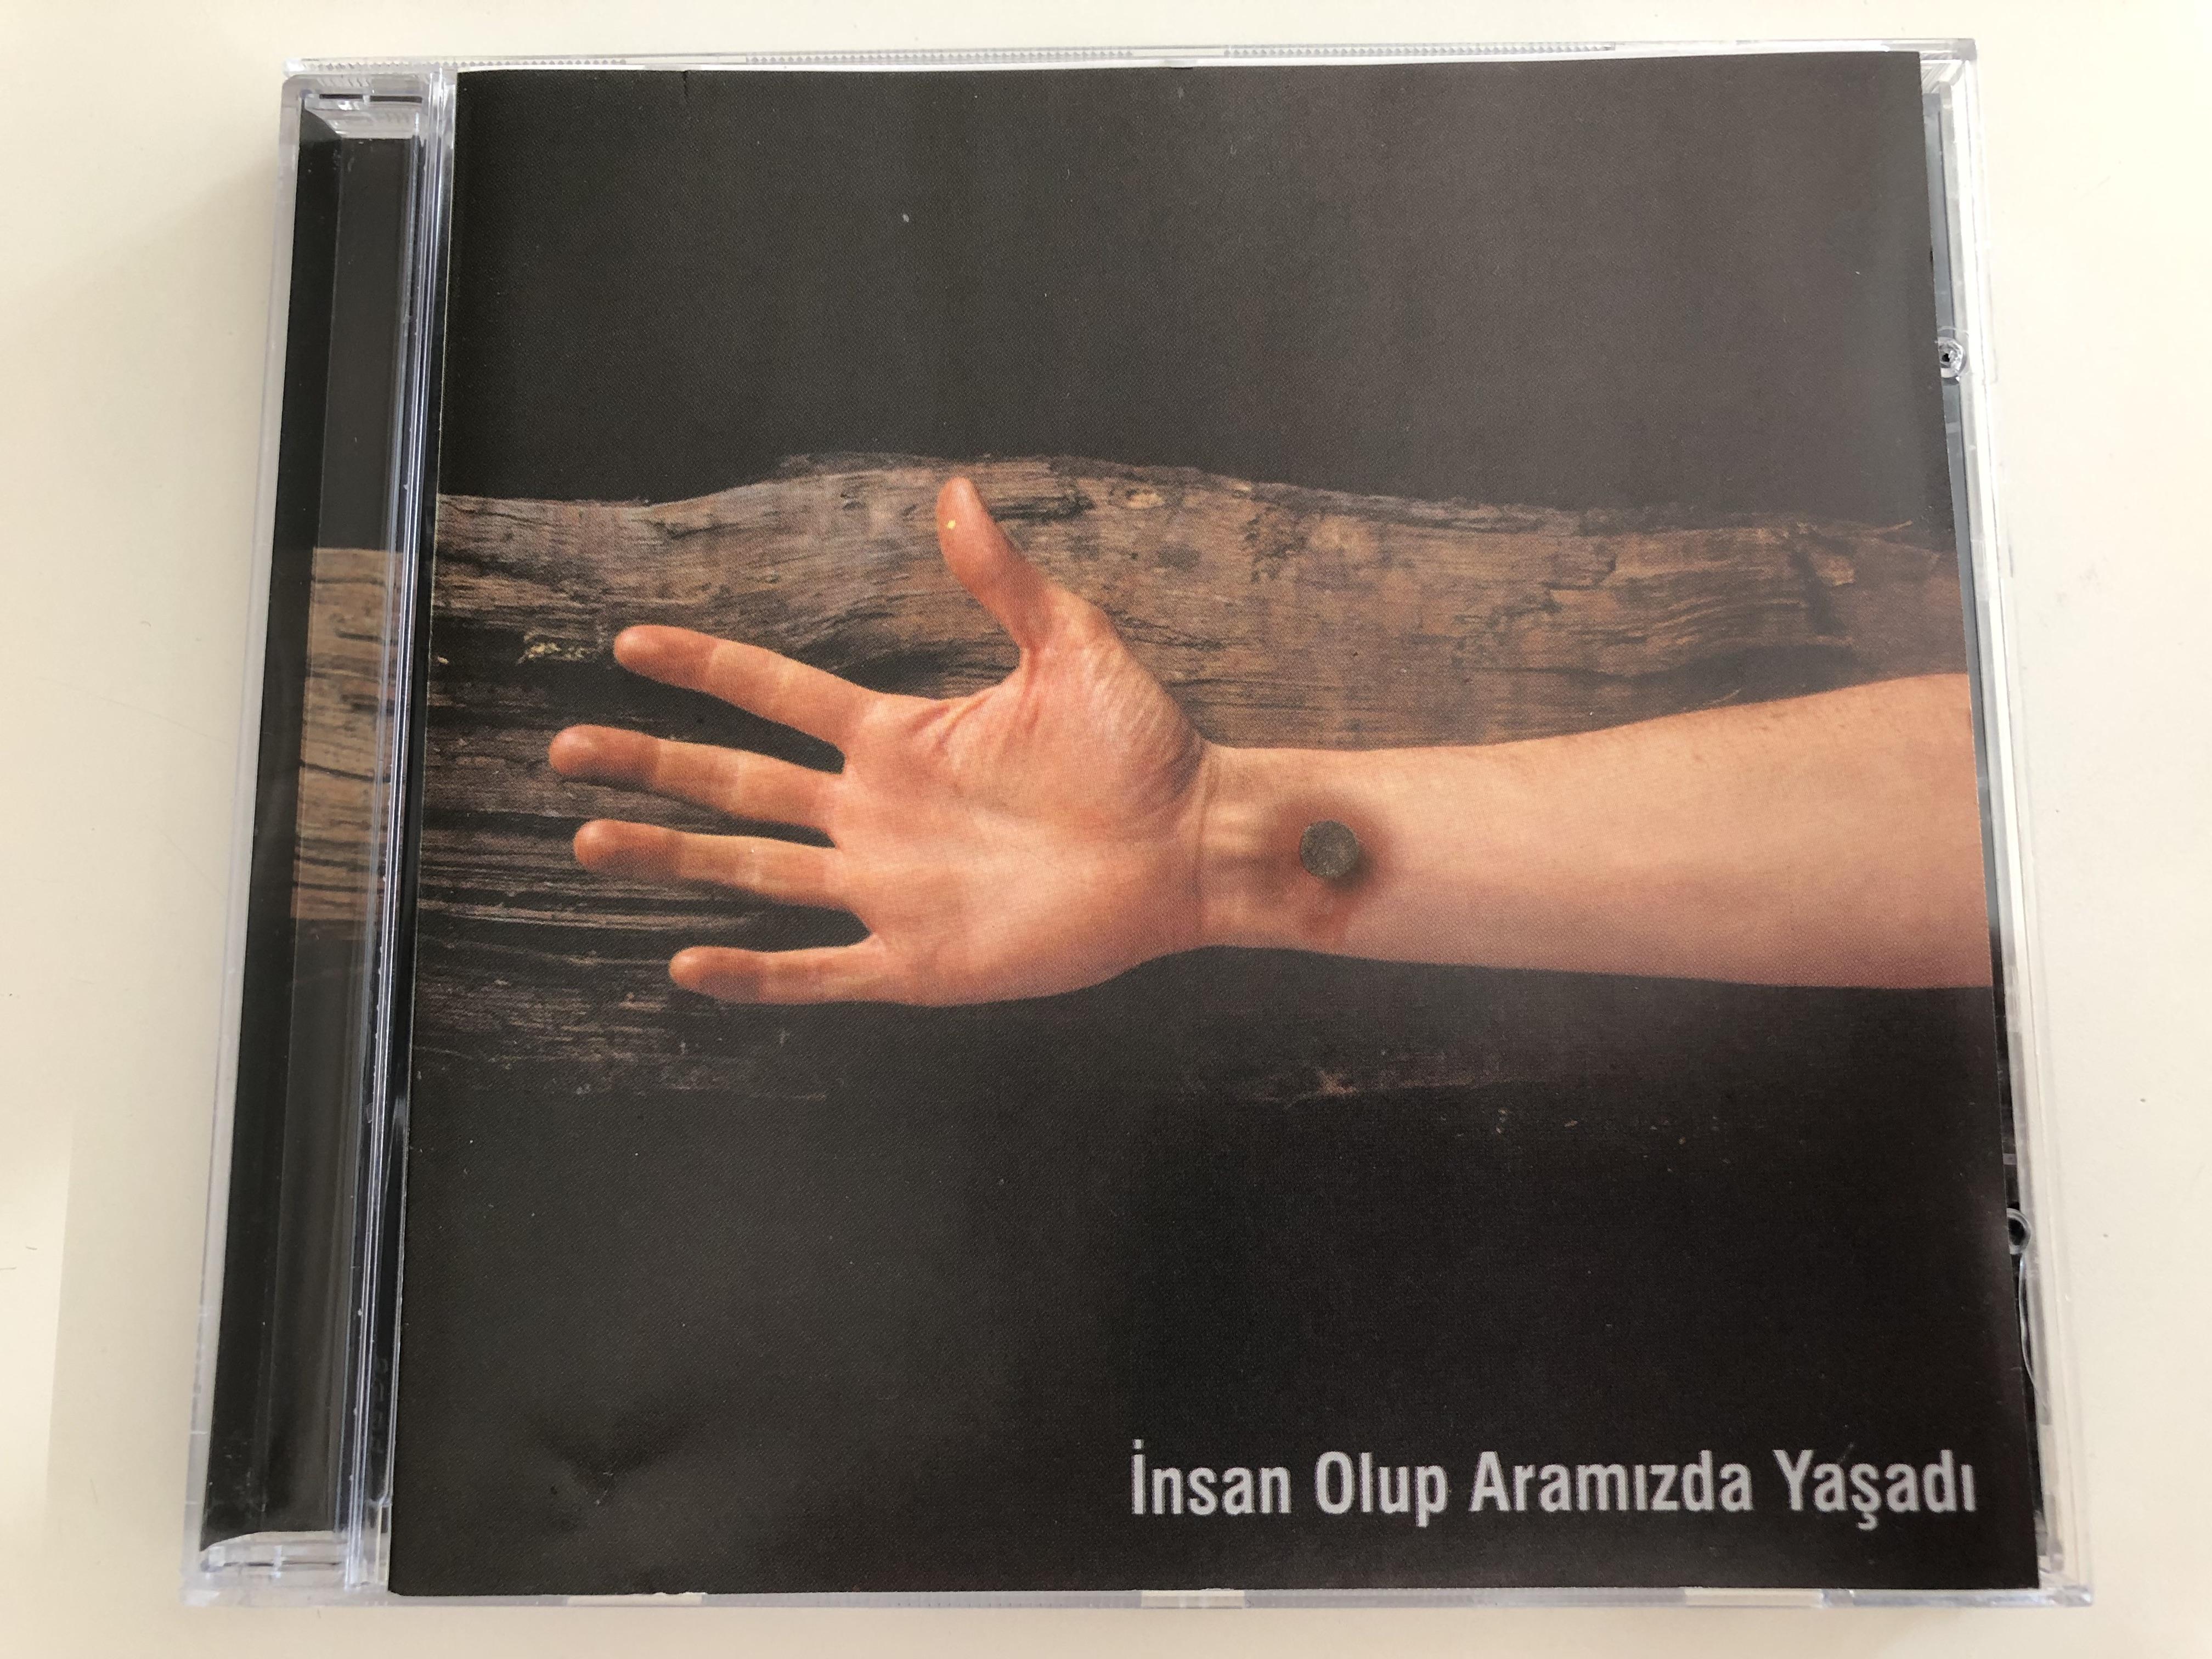 insan-olup-aramizda-ya-ad-turkish-christian-praise-and-worship-songs-audio-cd-2001-yeni-yasam-yayinlari-1-.jpg